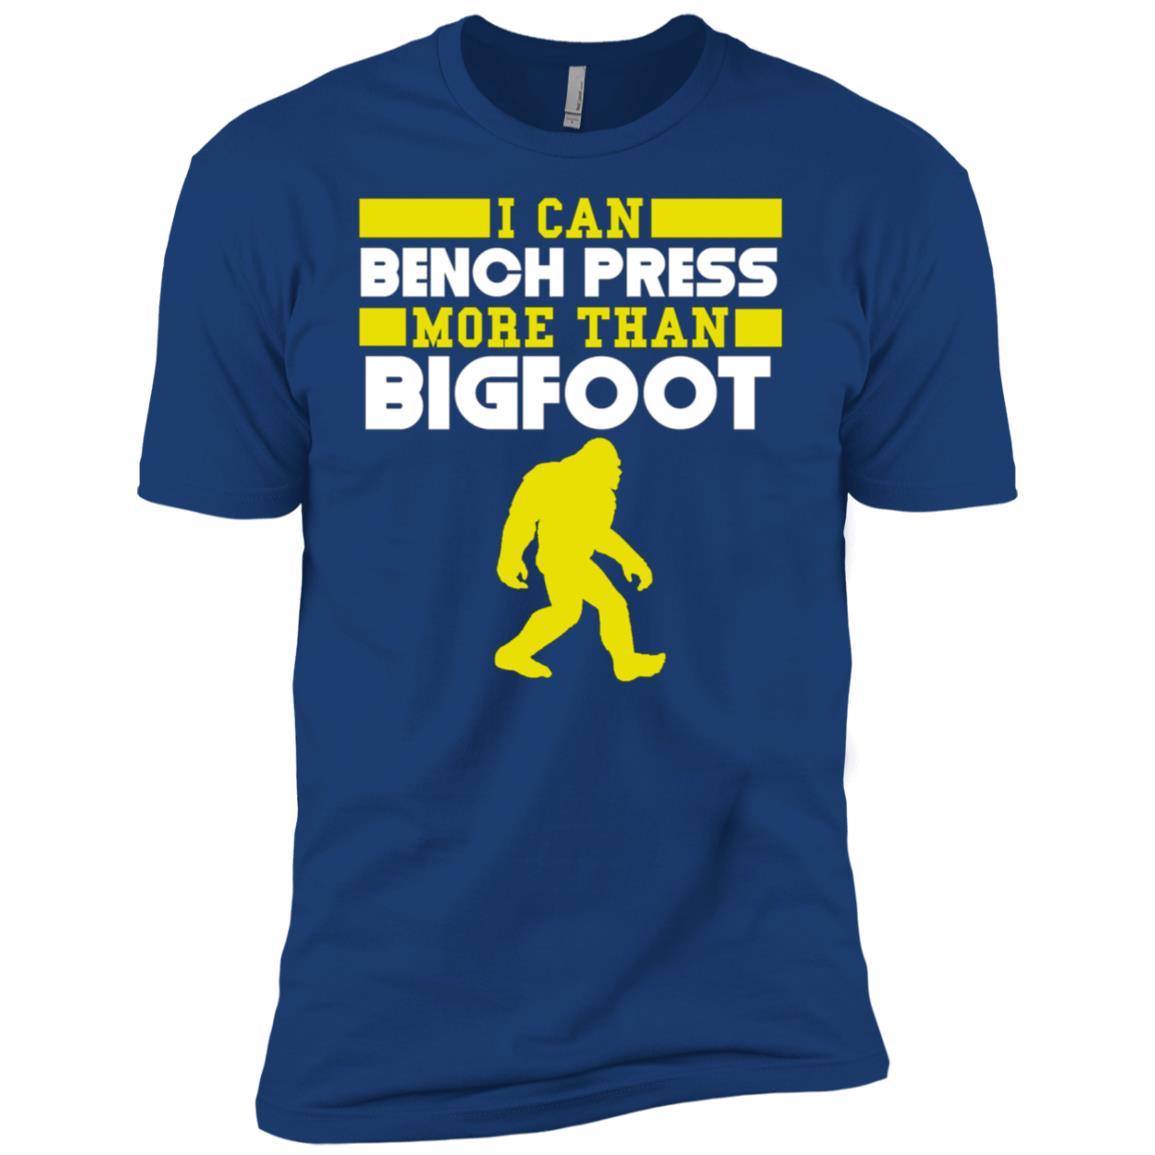 I Can Bench Press More Than Bigfoot Funny Men Short Sleeve T-Shirt